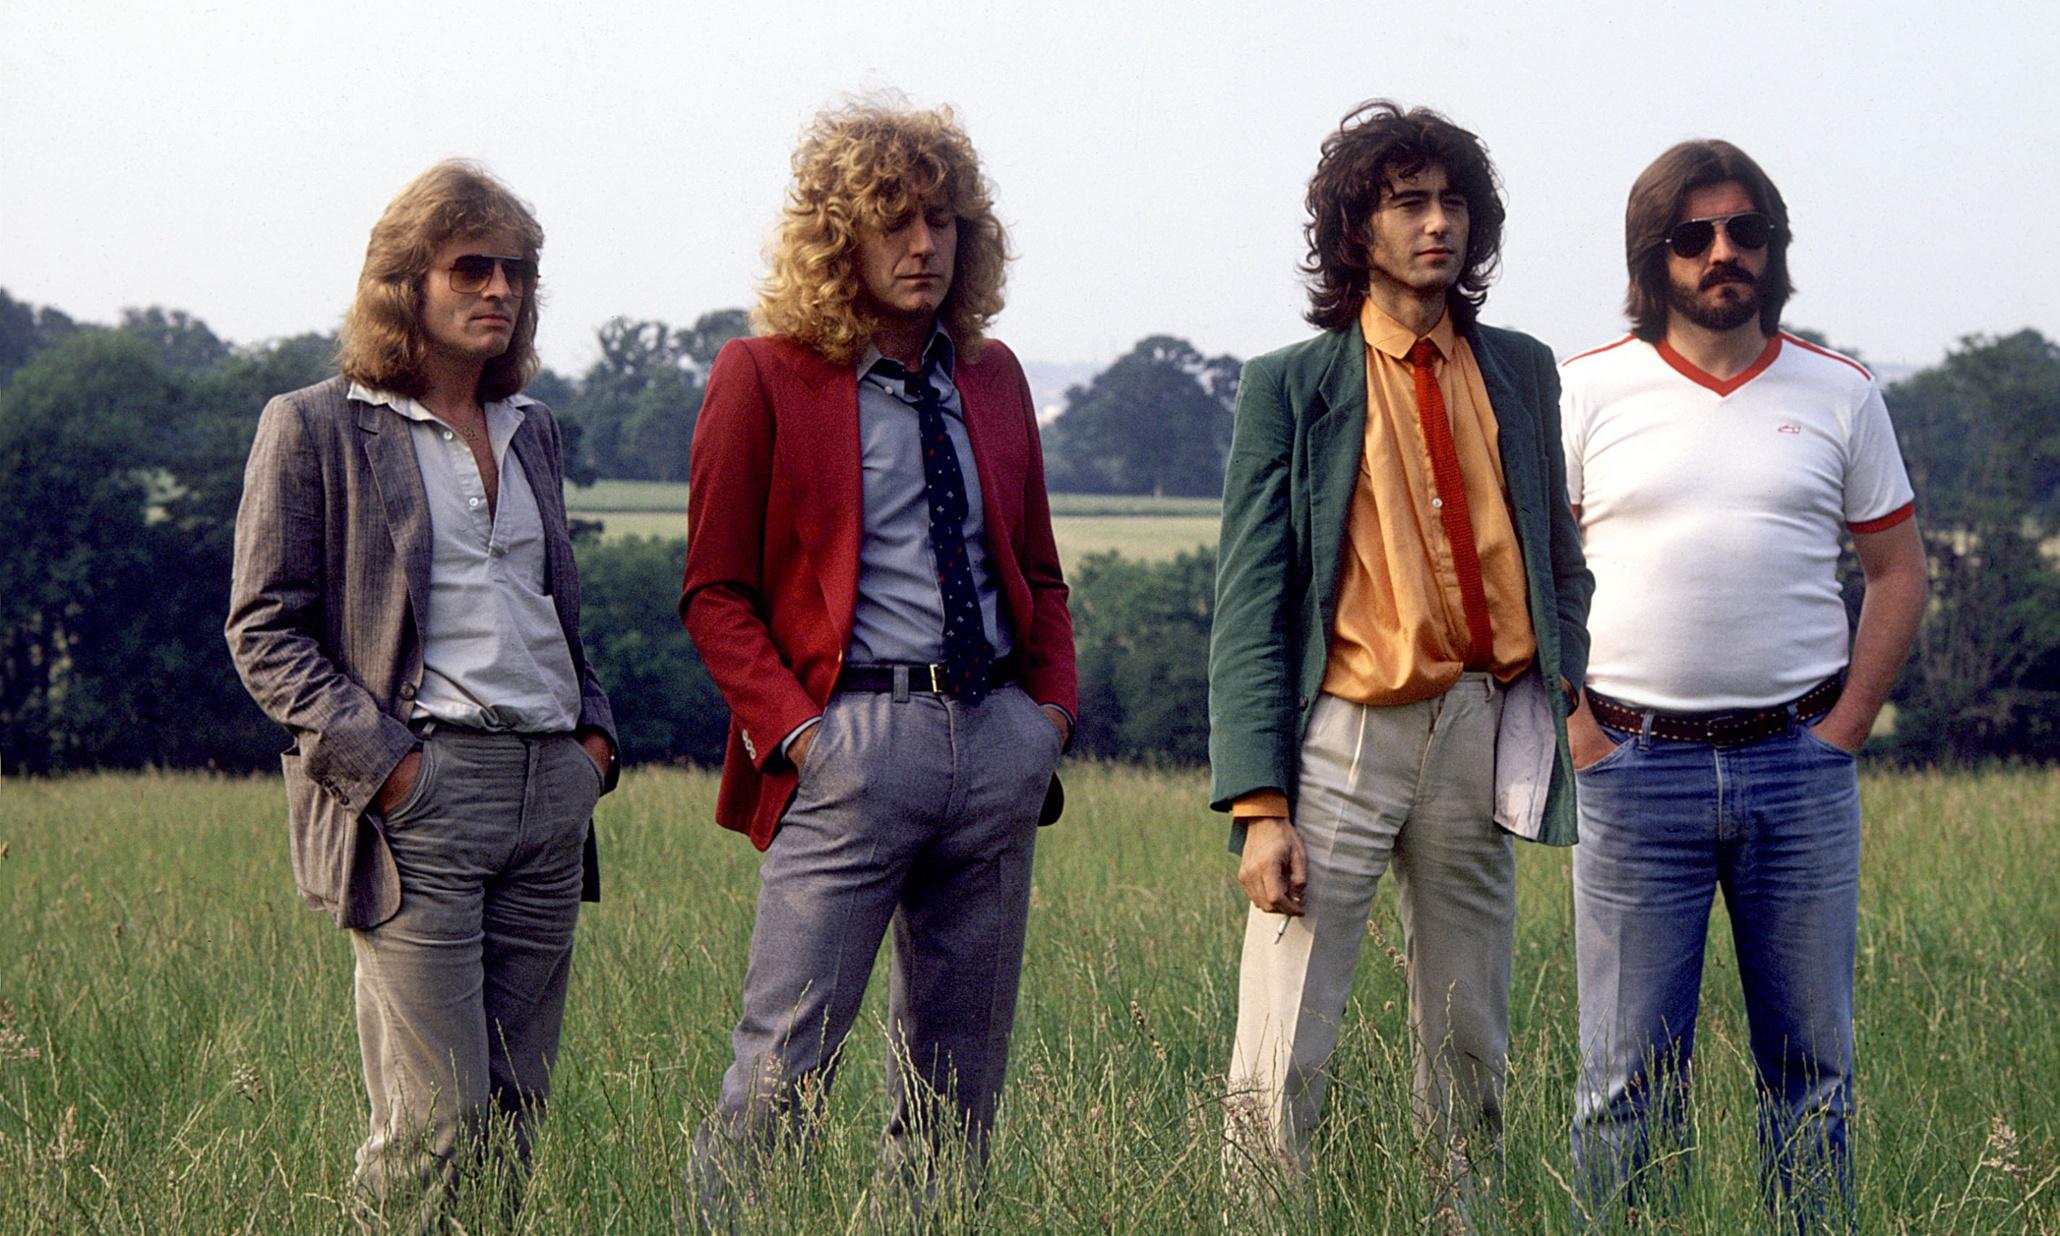 Vans договорились о коллаборации с Led Zeppelin